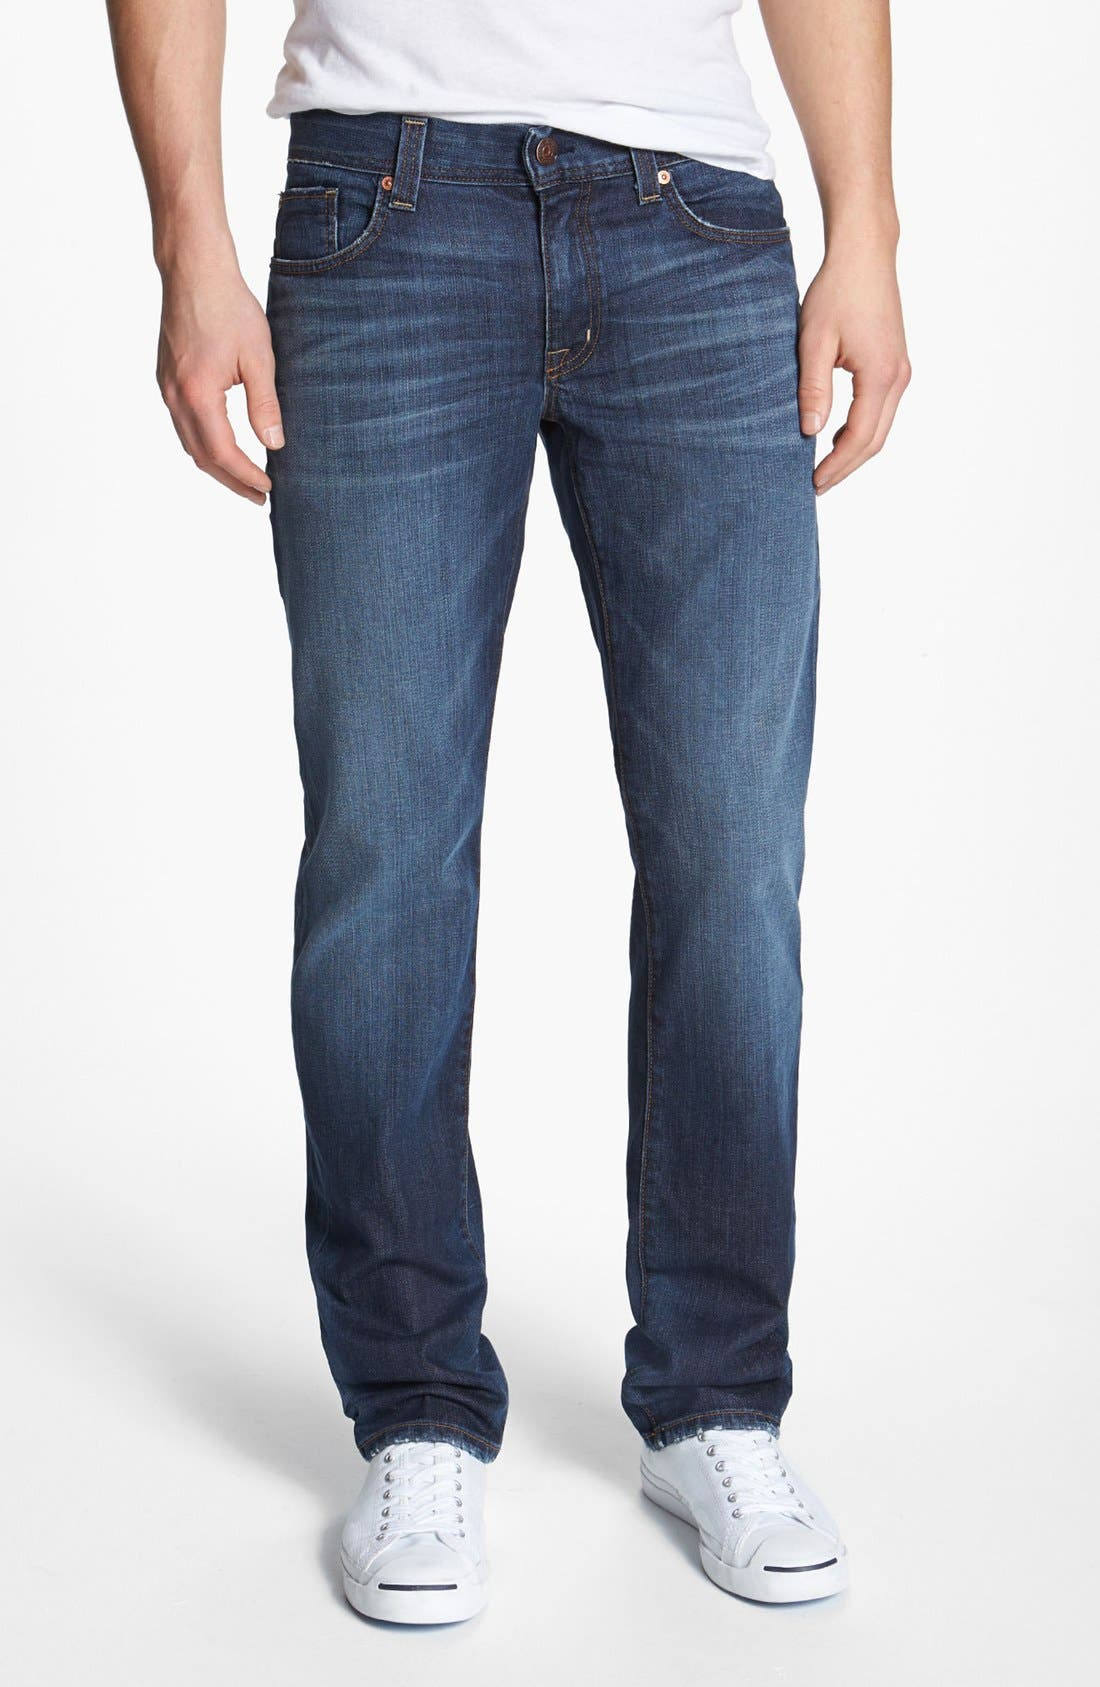 Alternate Image 1 Selected - Fidelity Denim 'Slim Jim' Slim Fit Jeans (Windsor Blue)